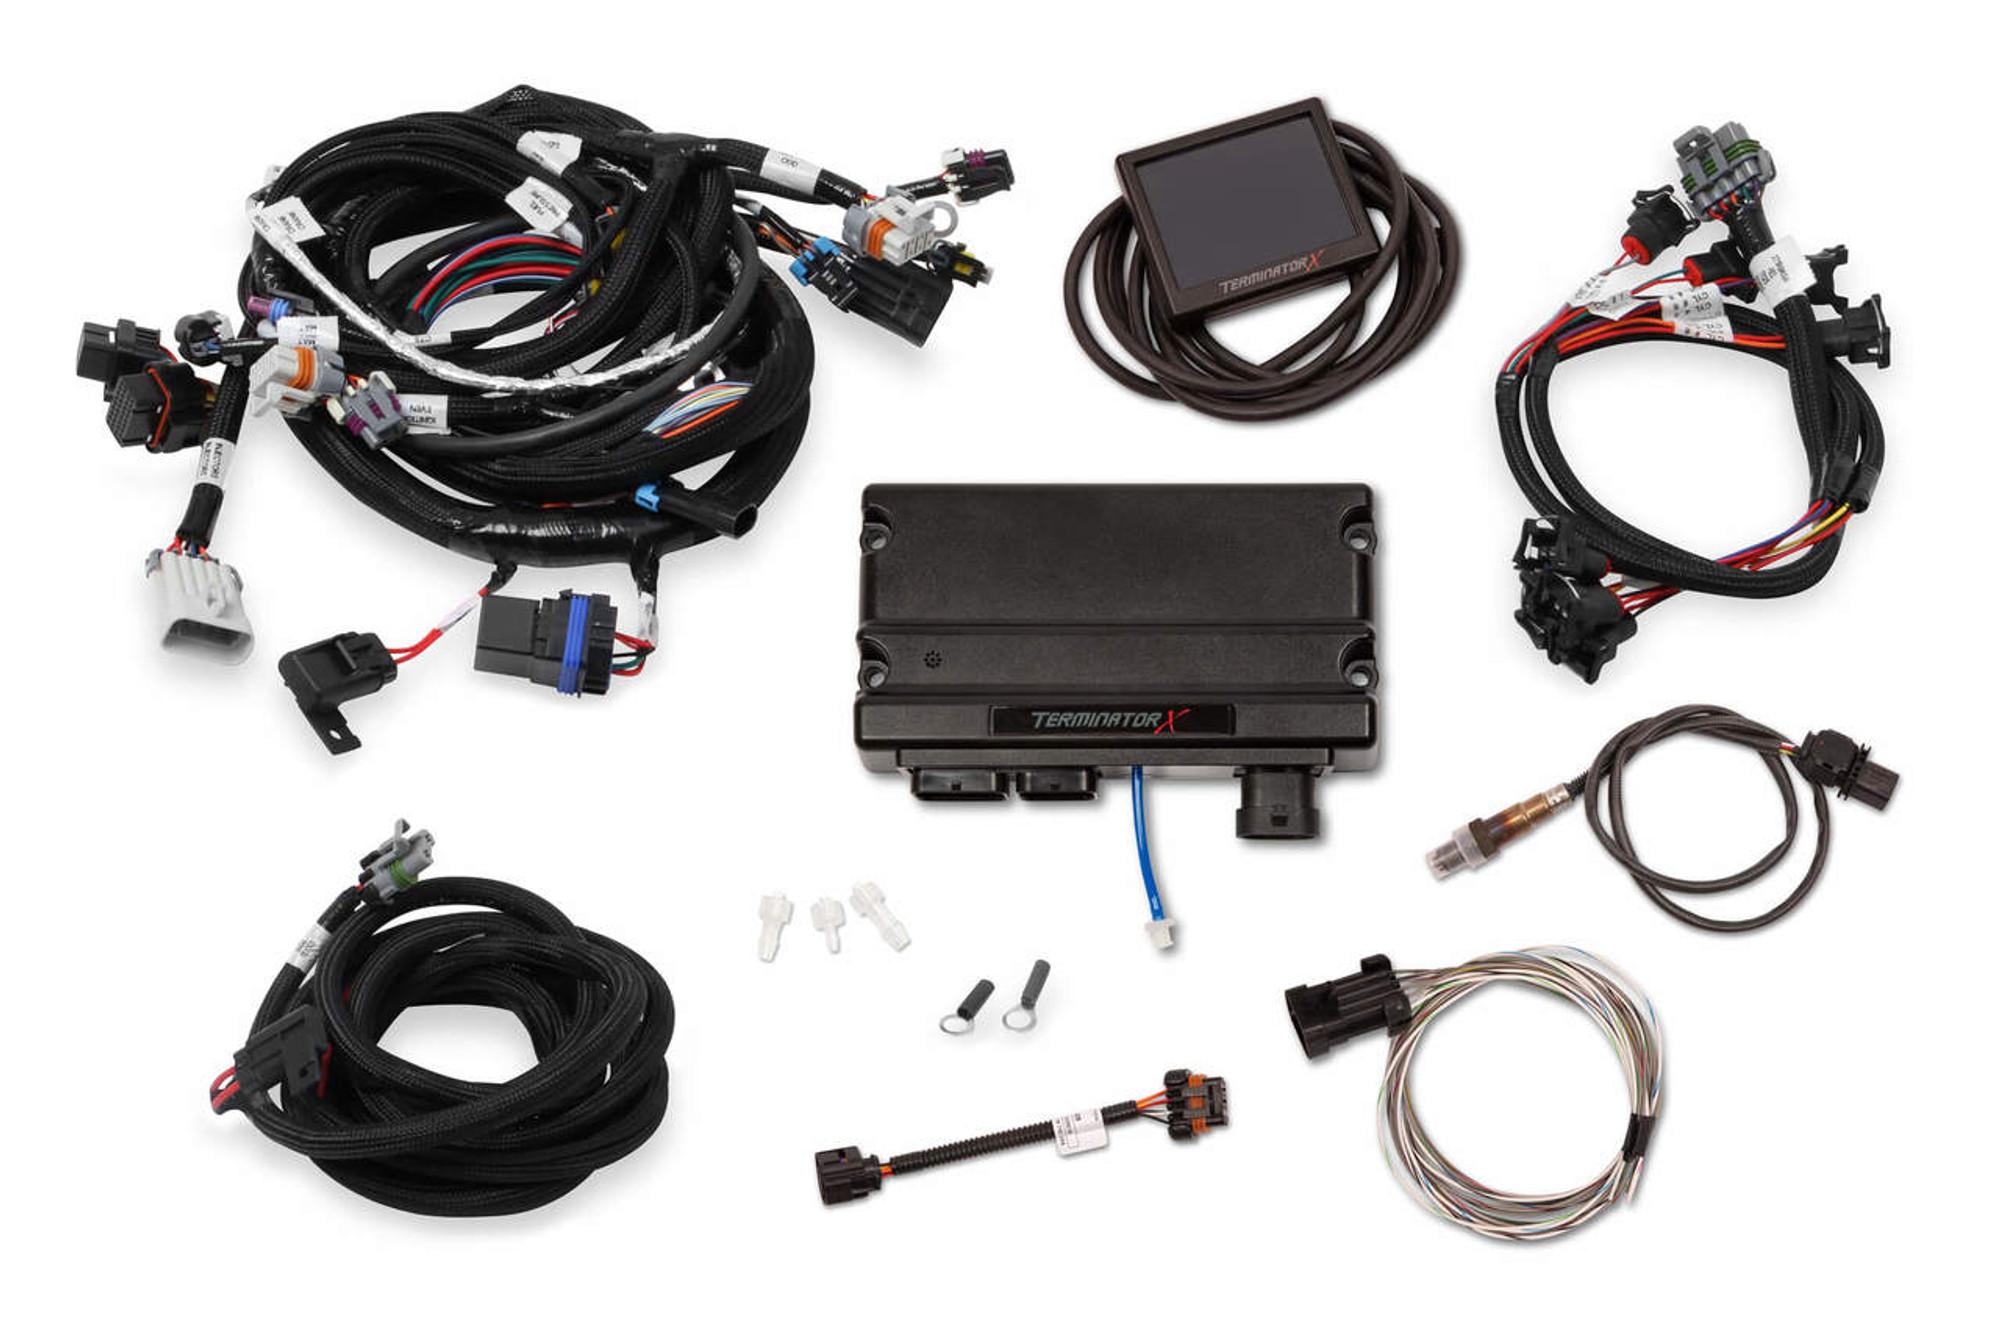 hight resolution of holley efi terminator x ls1 24x 1x mpfi kit 550 903